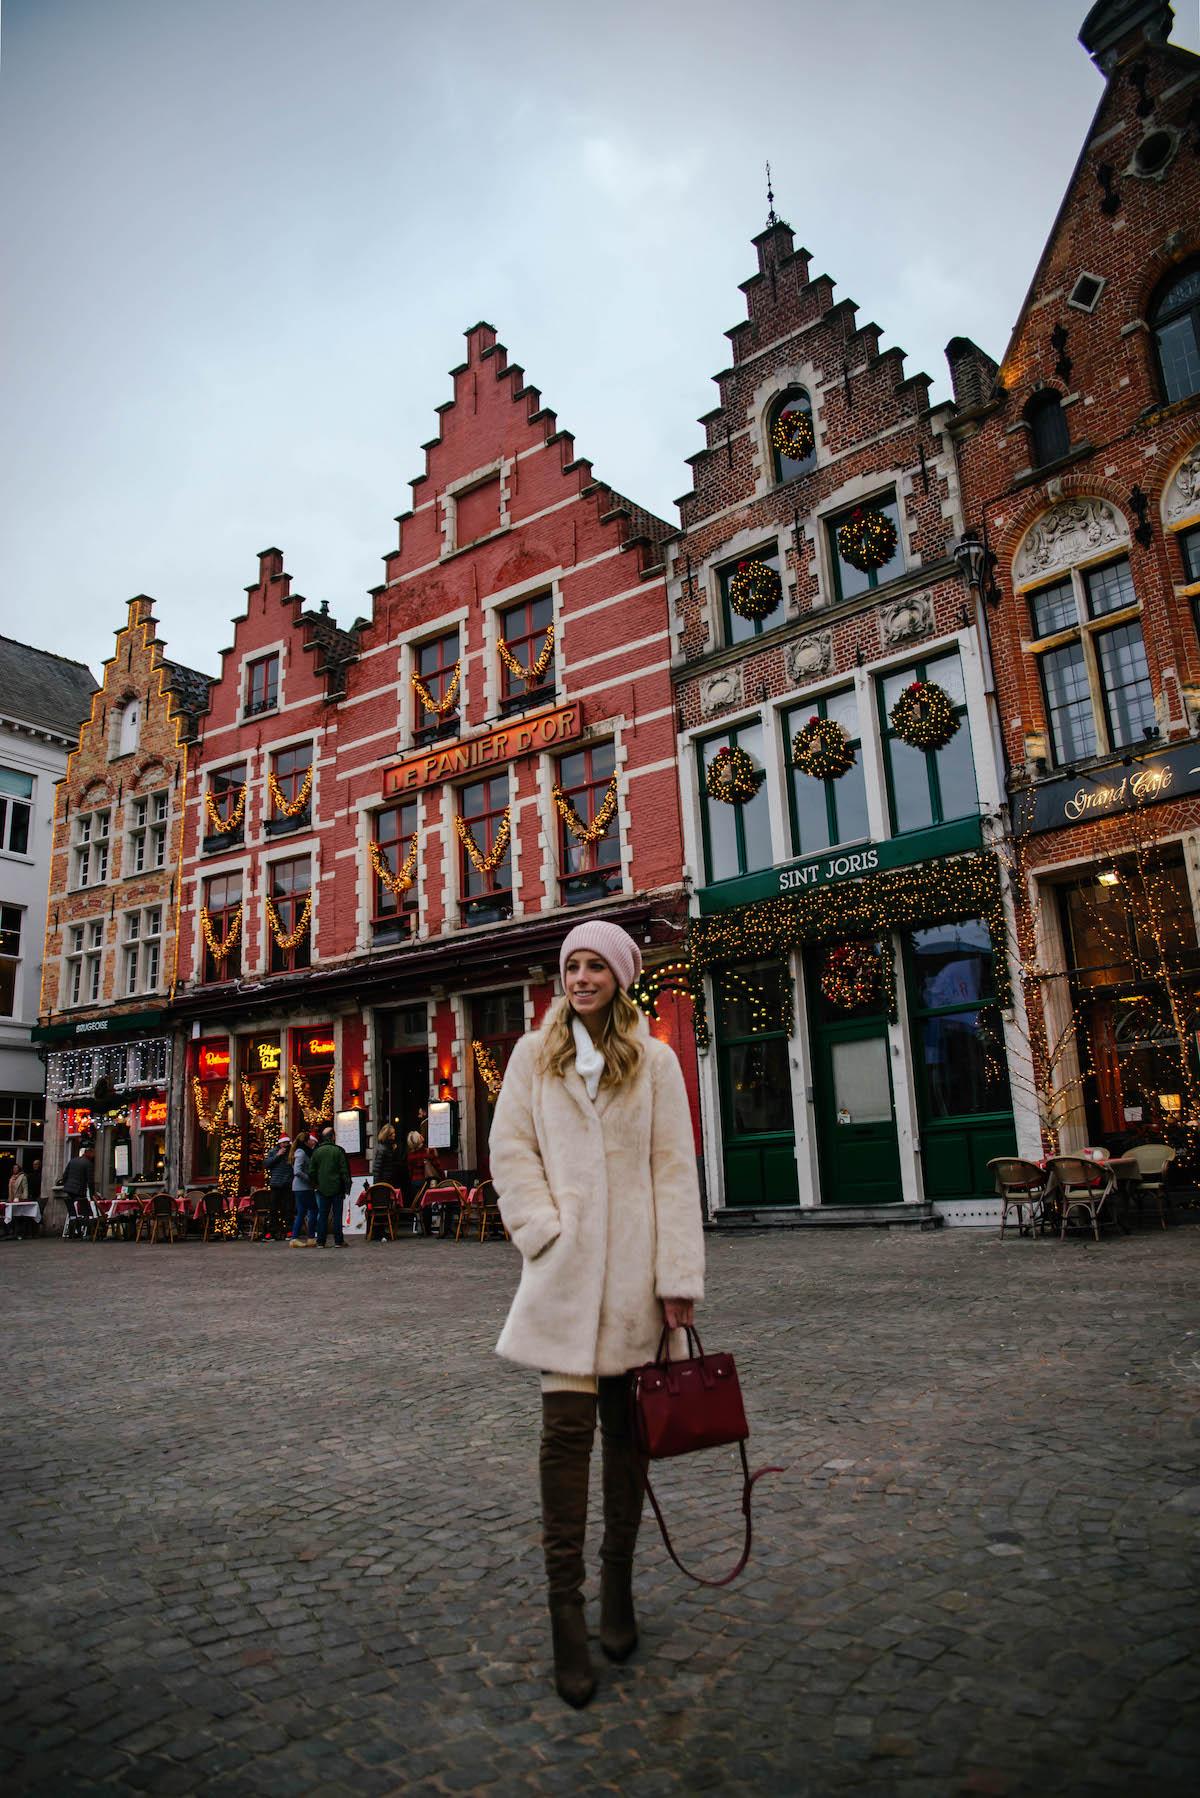 Brugge Travel Guide